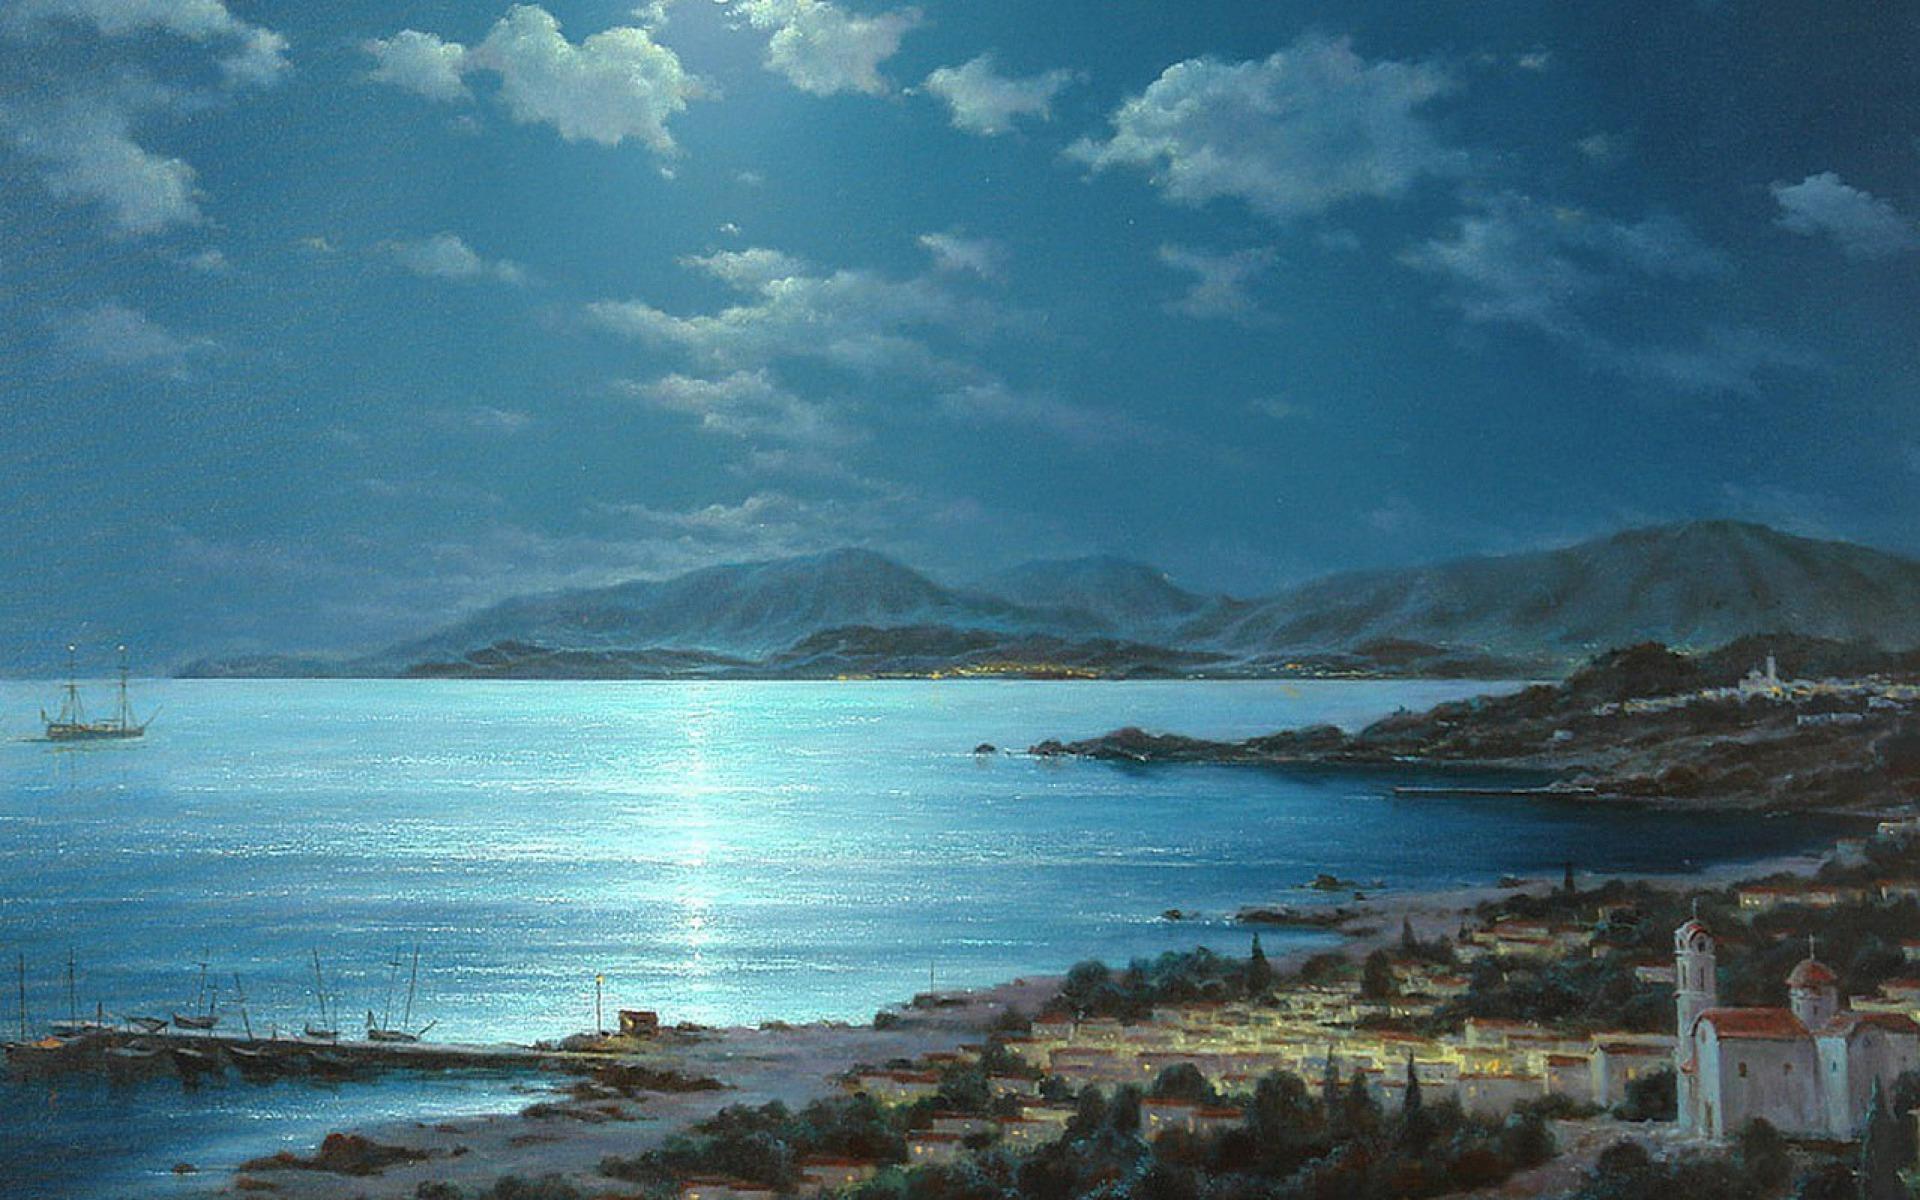 1920x1200 Beautiful Night Crete Greece desktop PC and Mac wallpaper 1920x1200